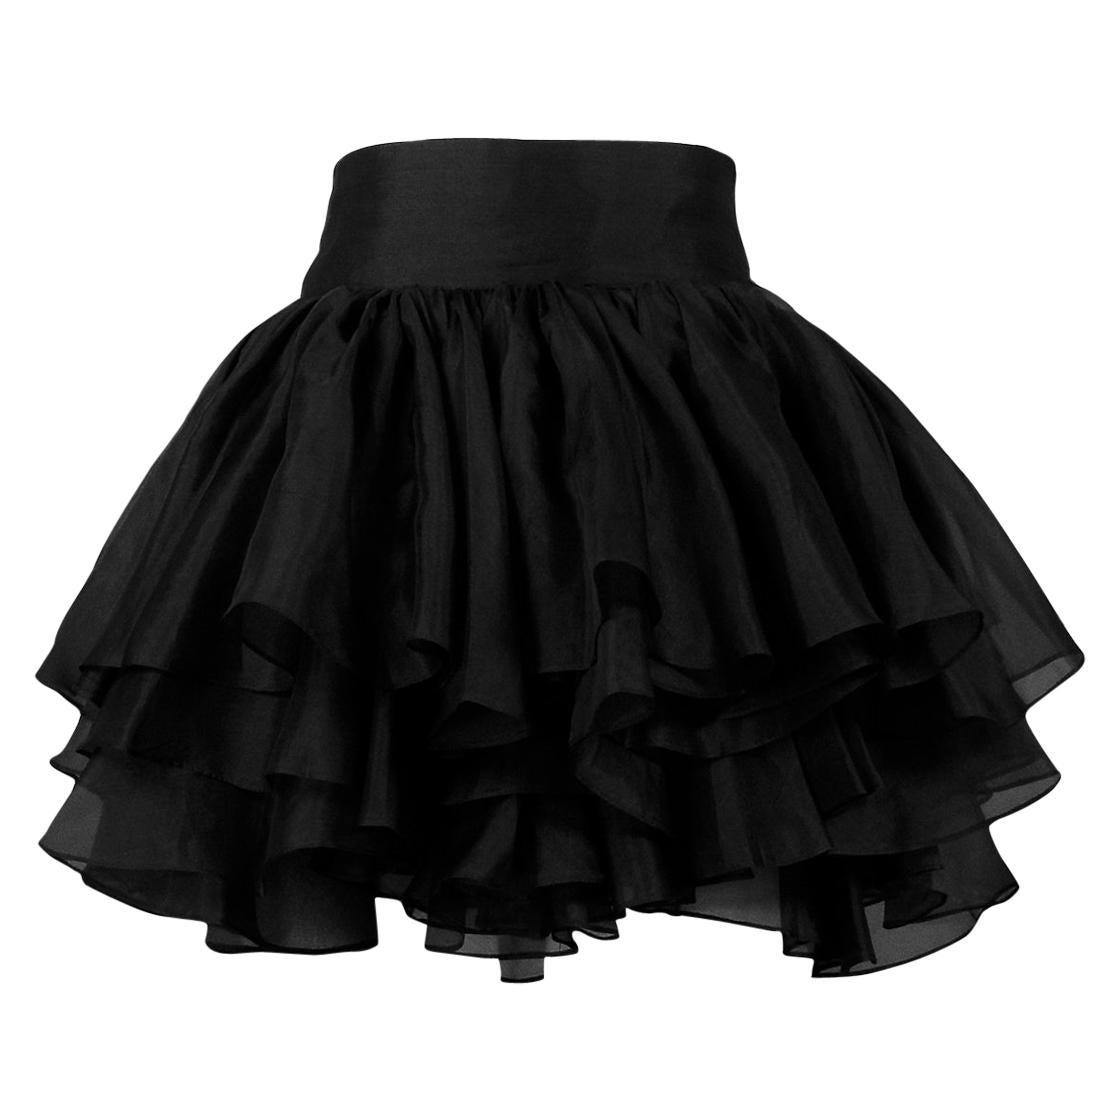 Vintage Complice Black Organza Three Tier Mini Skirt 1991